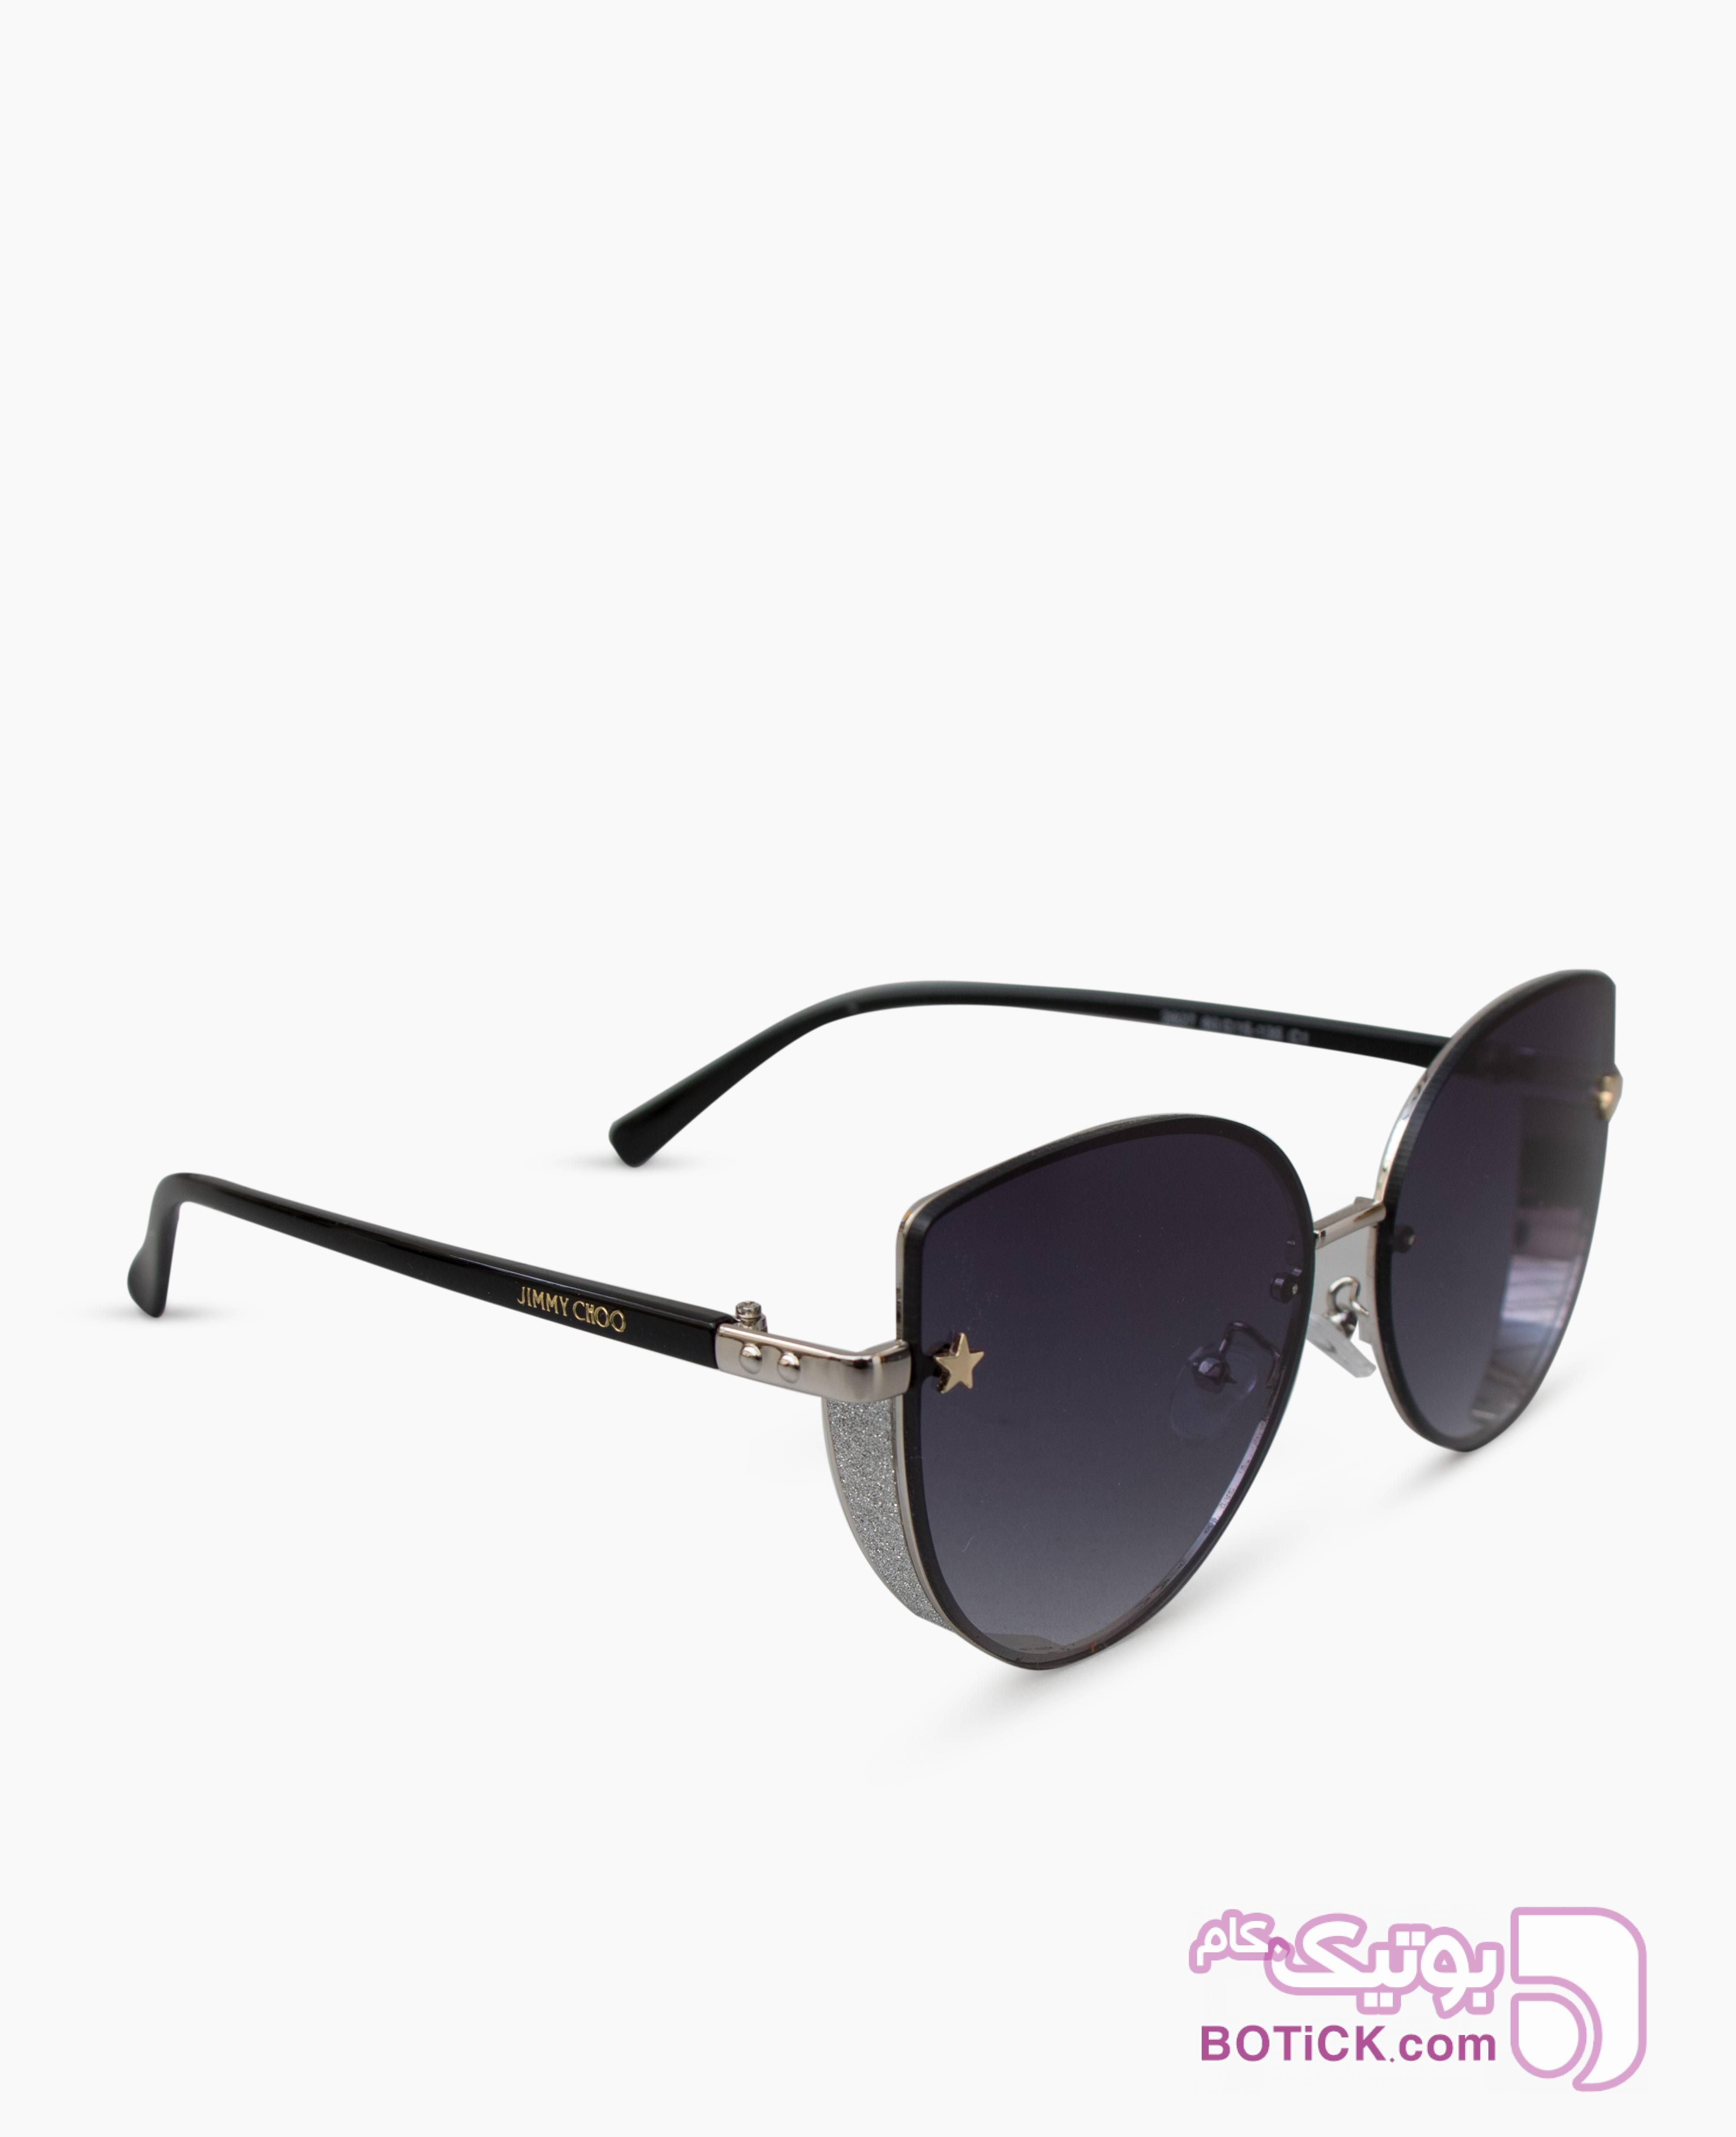 عینک آفتابی زنانه Jimmy Choo کد 2827 نقره ای عینک آفتابی